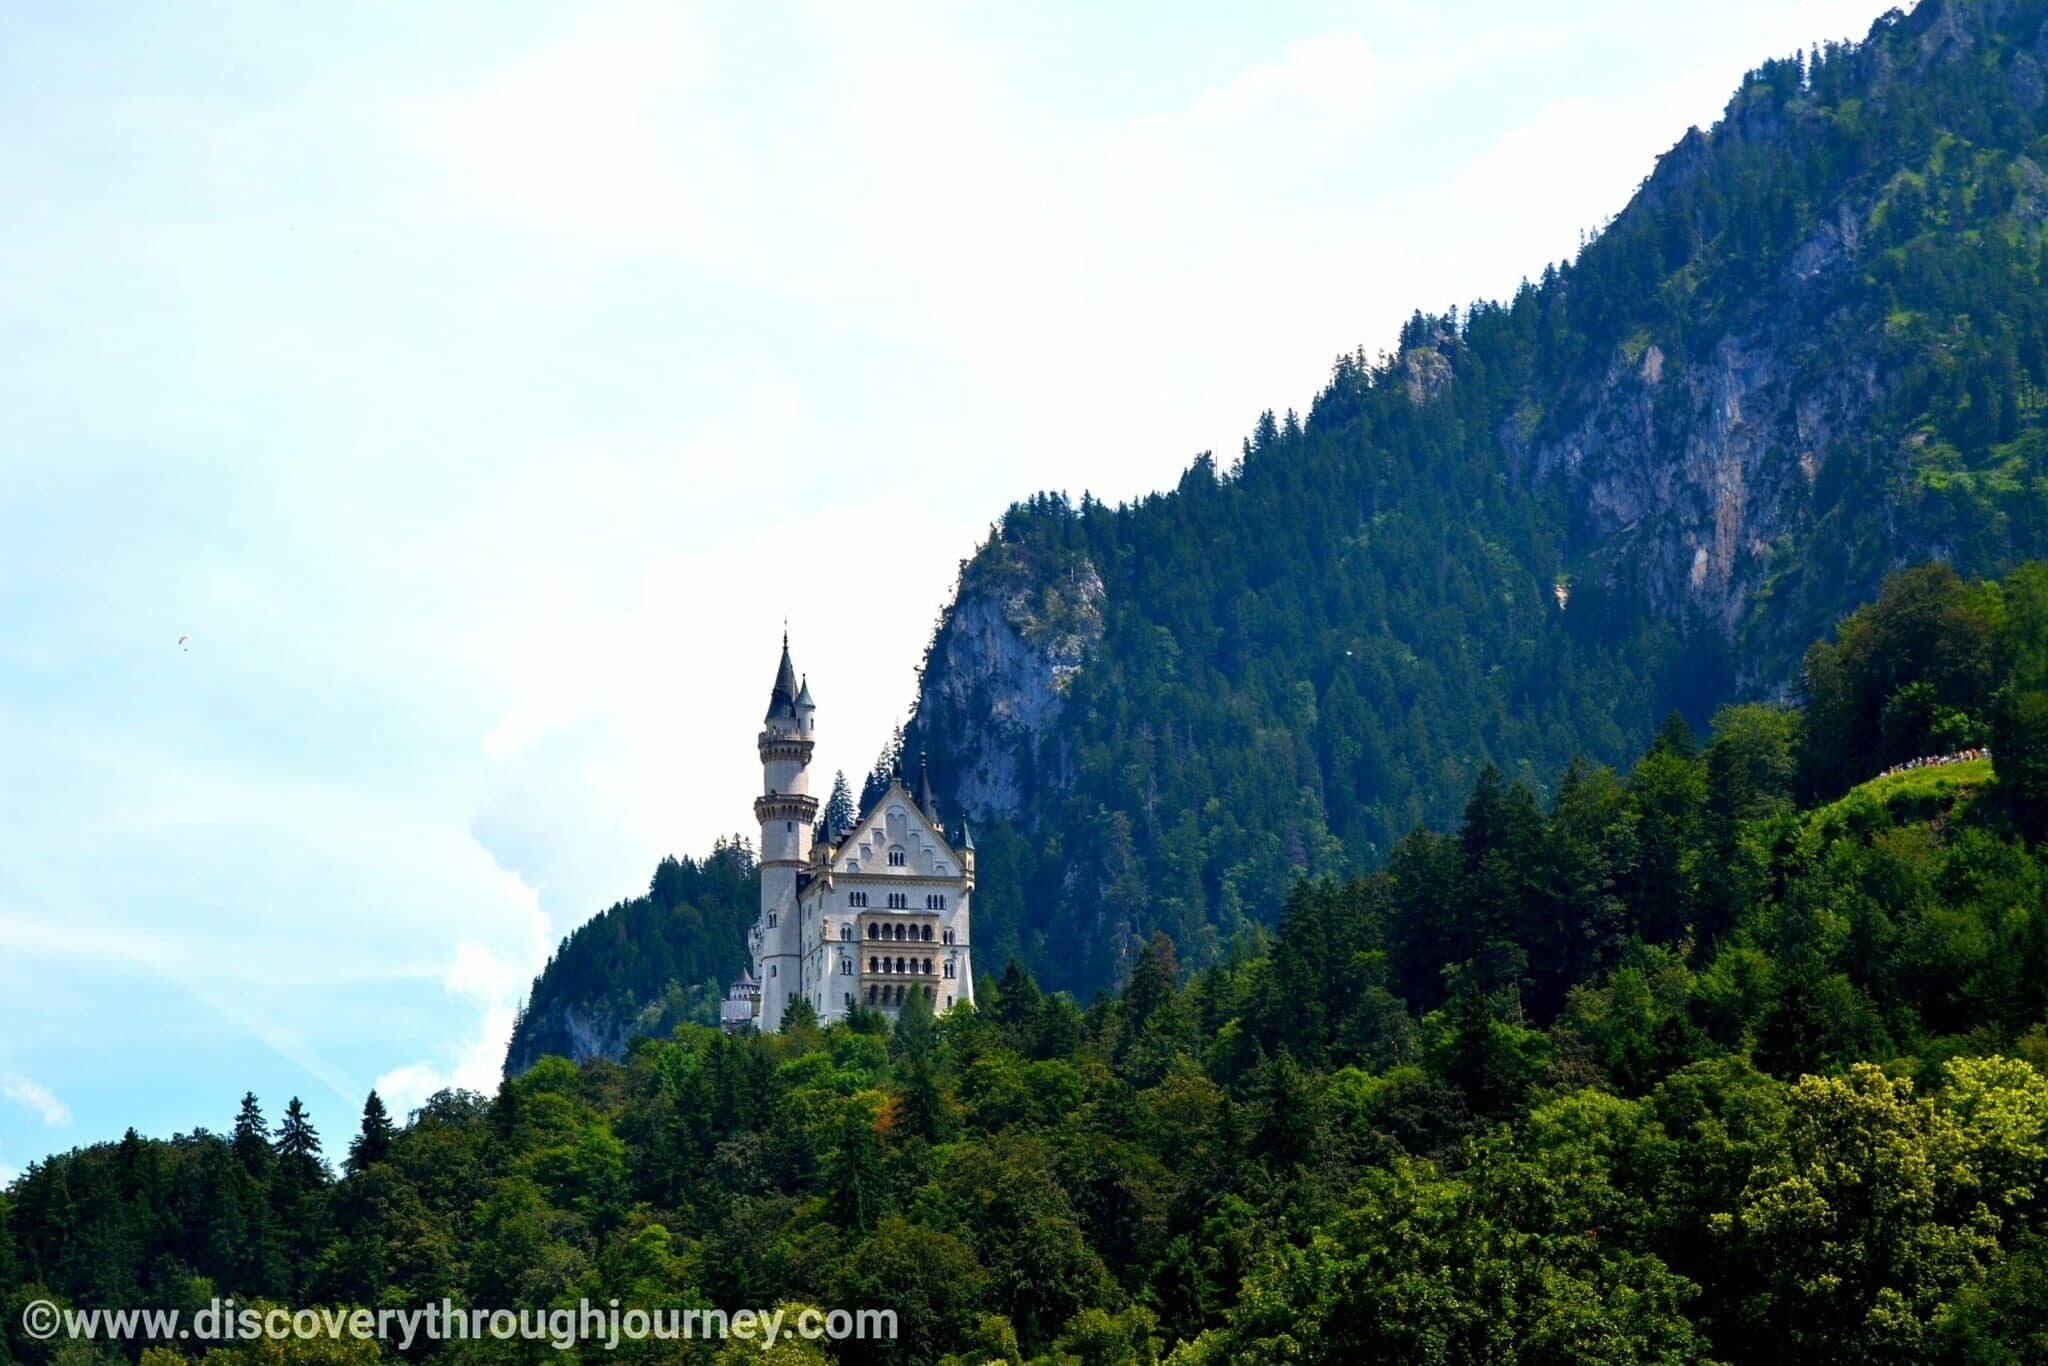 The fairy-tale castle: The Neuschwanstein Castle, Hohenschwangau, Germany